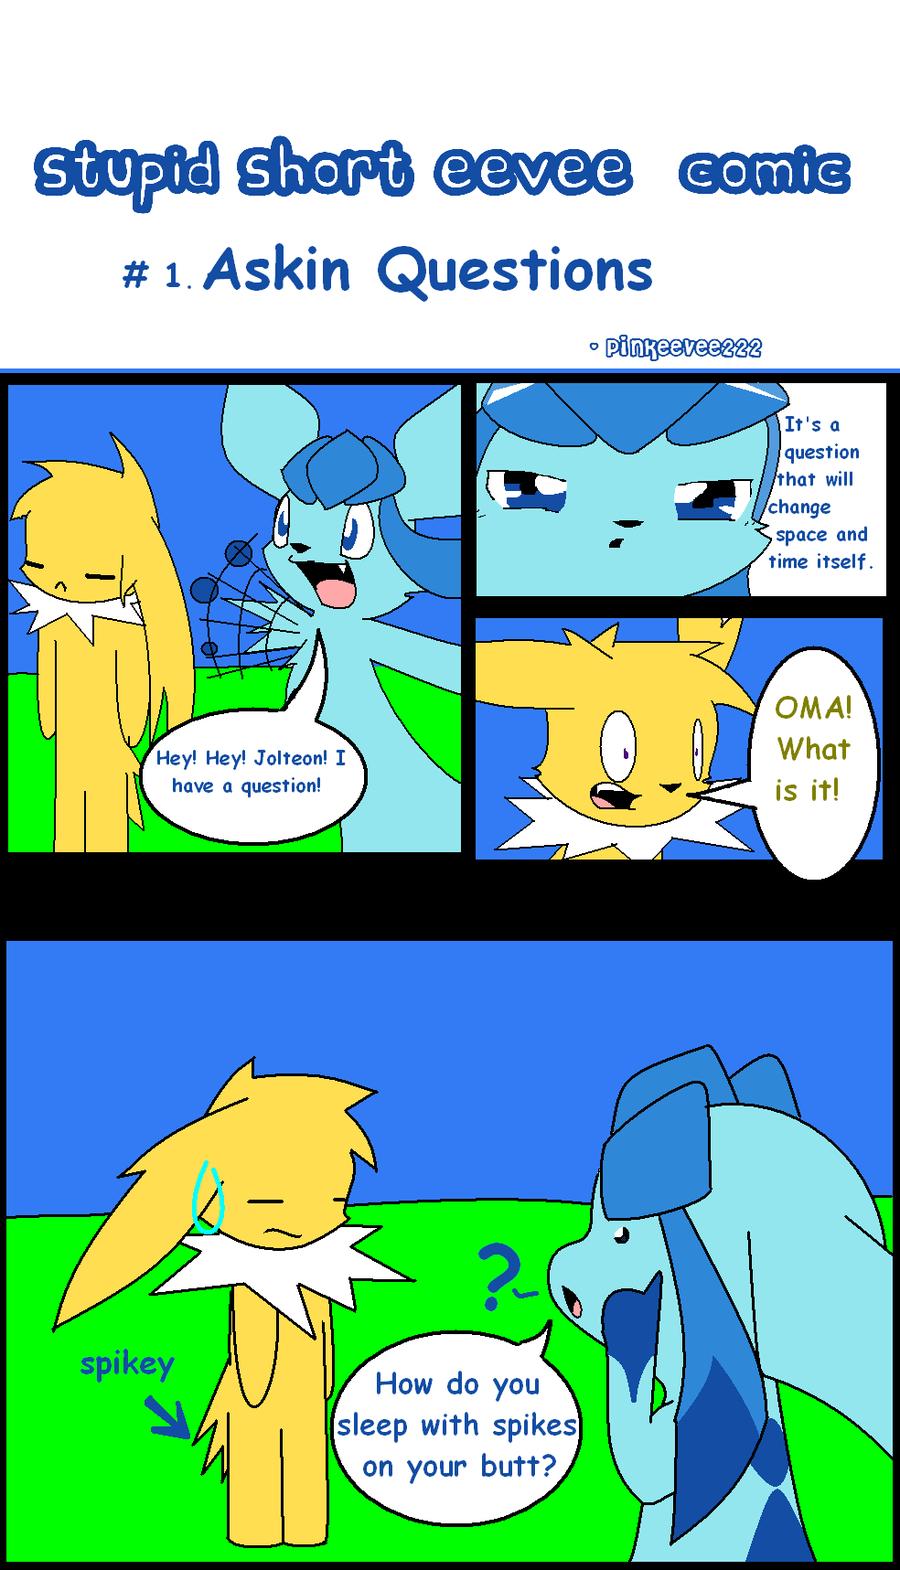 Stupid Short eevee comic 1